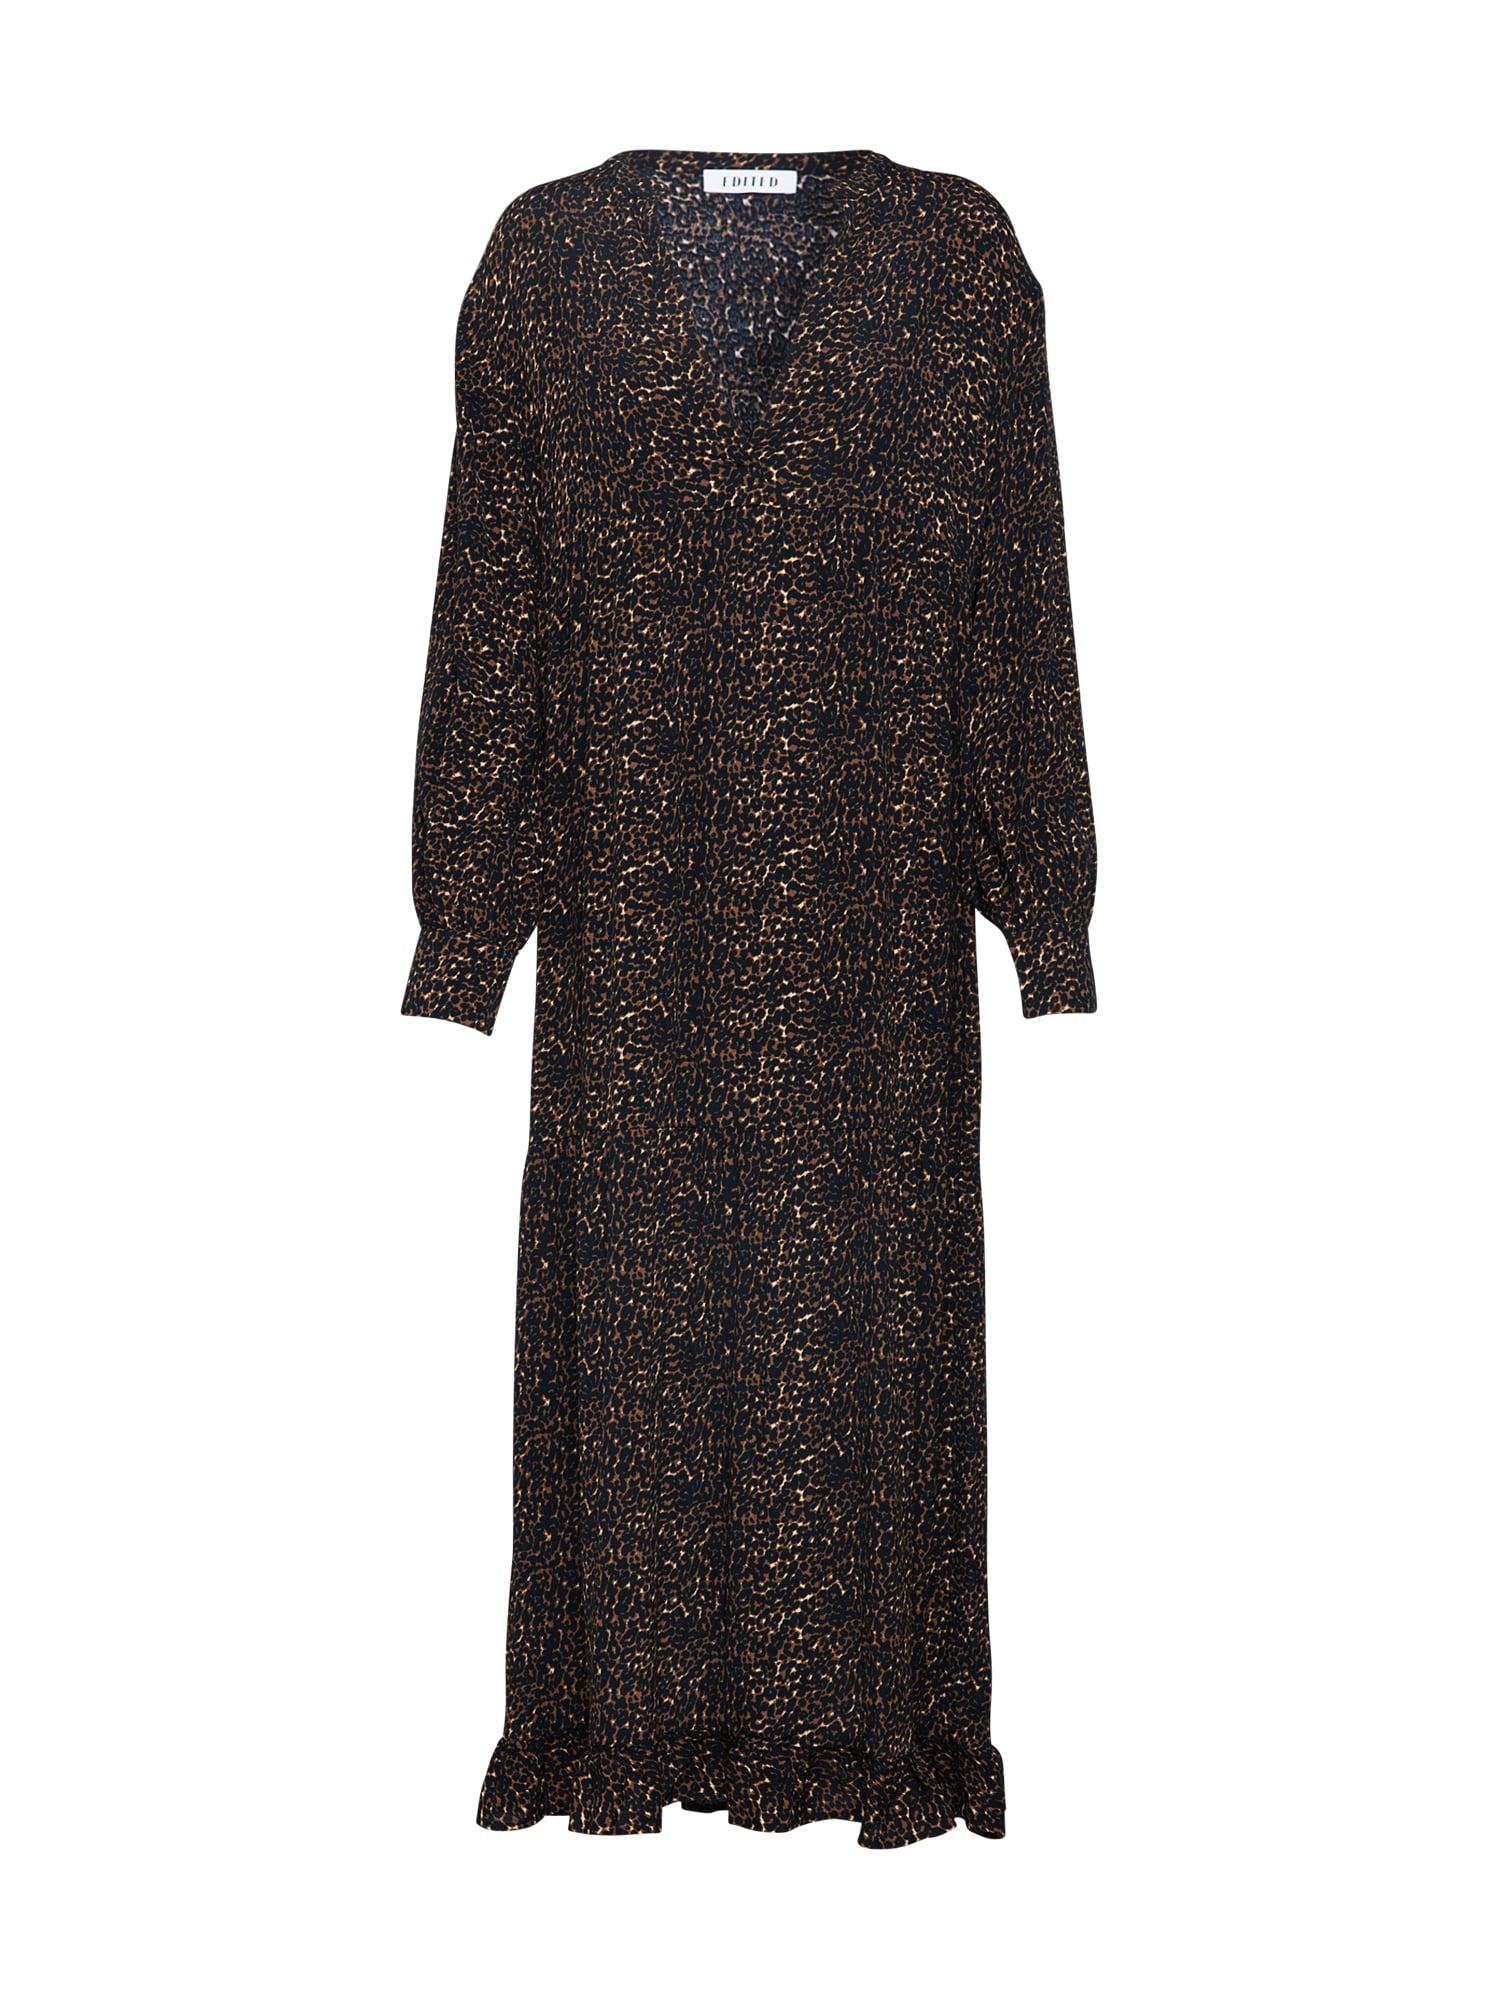 Šaty Chloe béžová hnědá černá EDITED